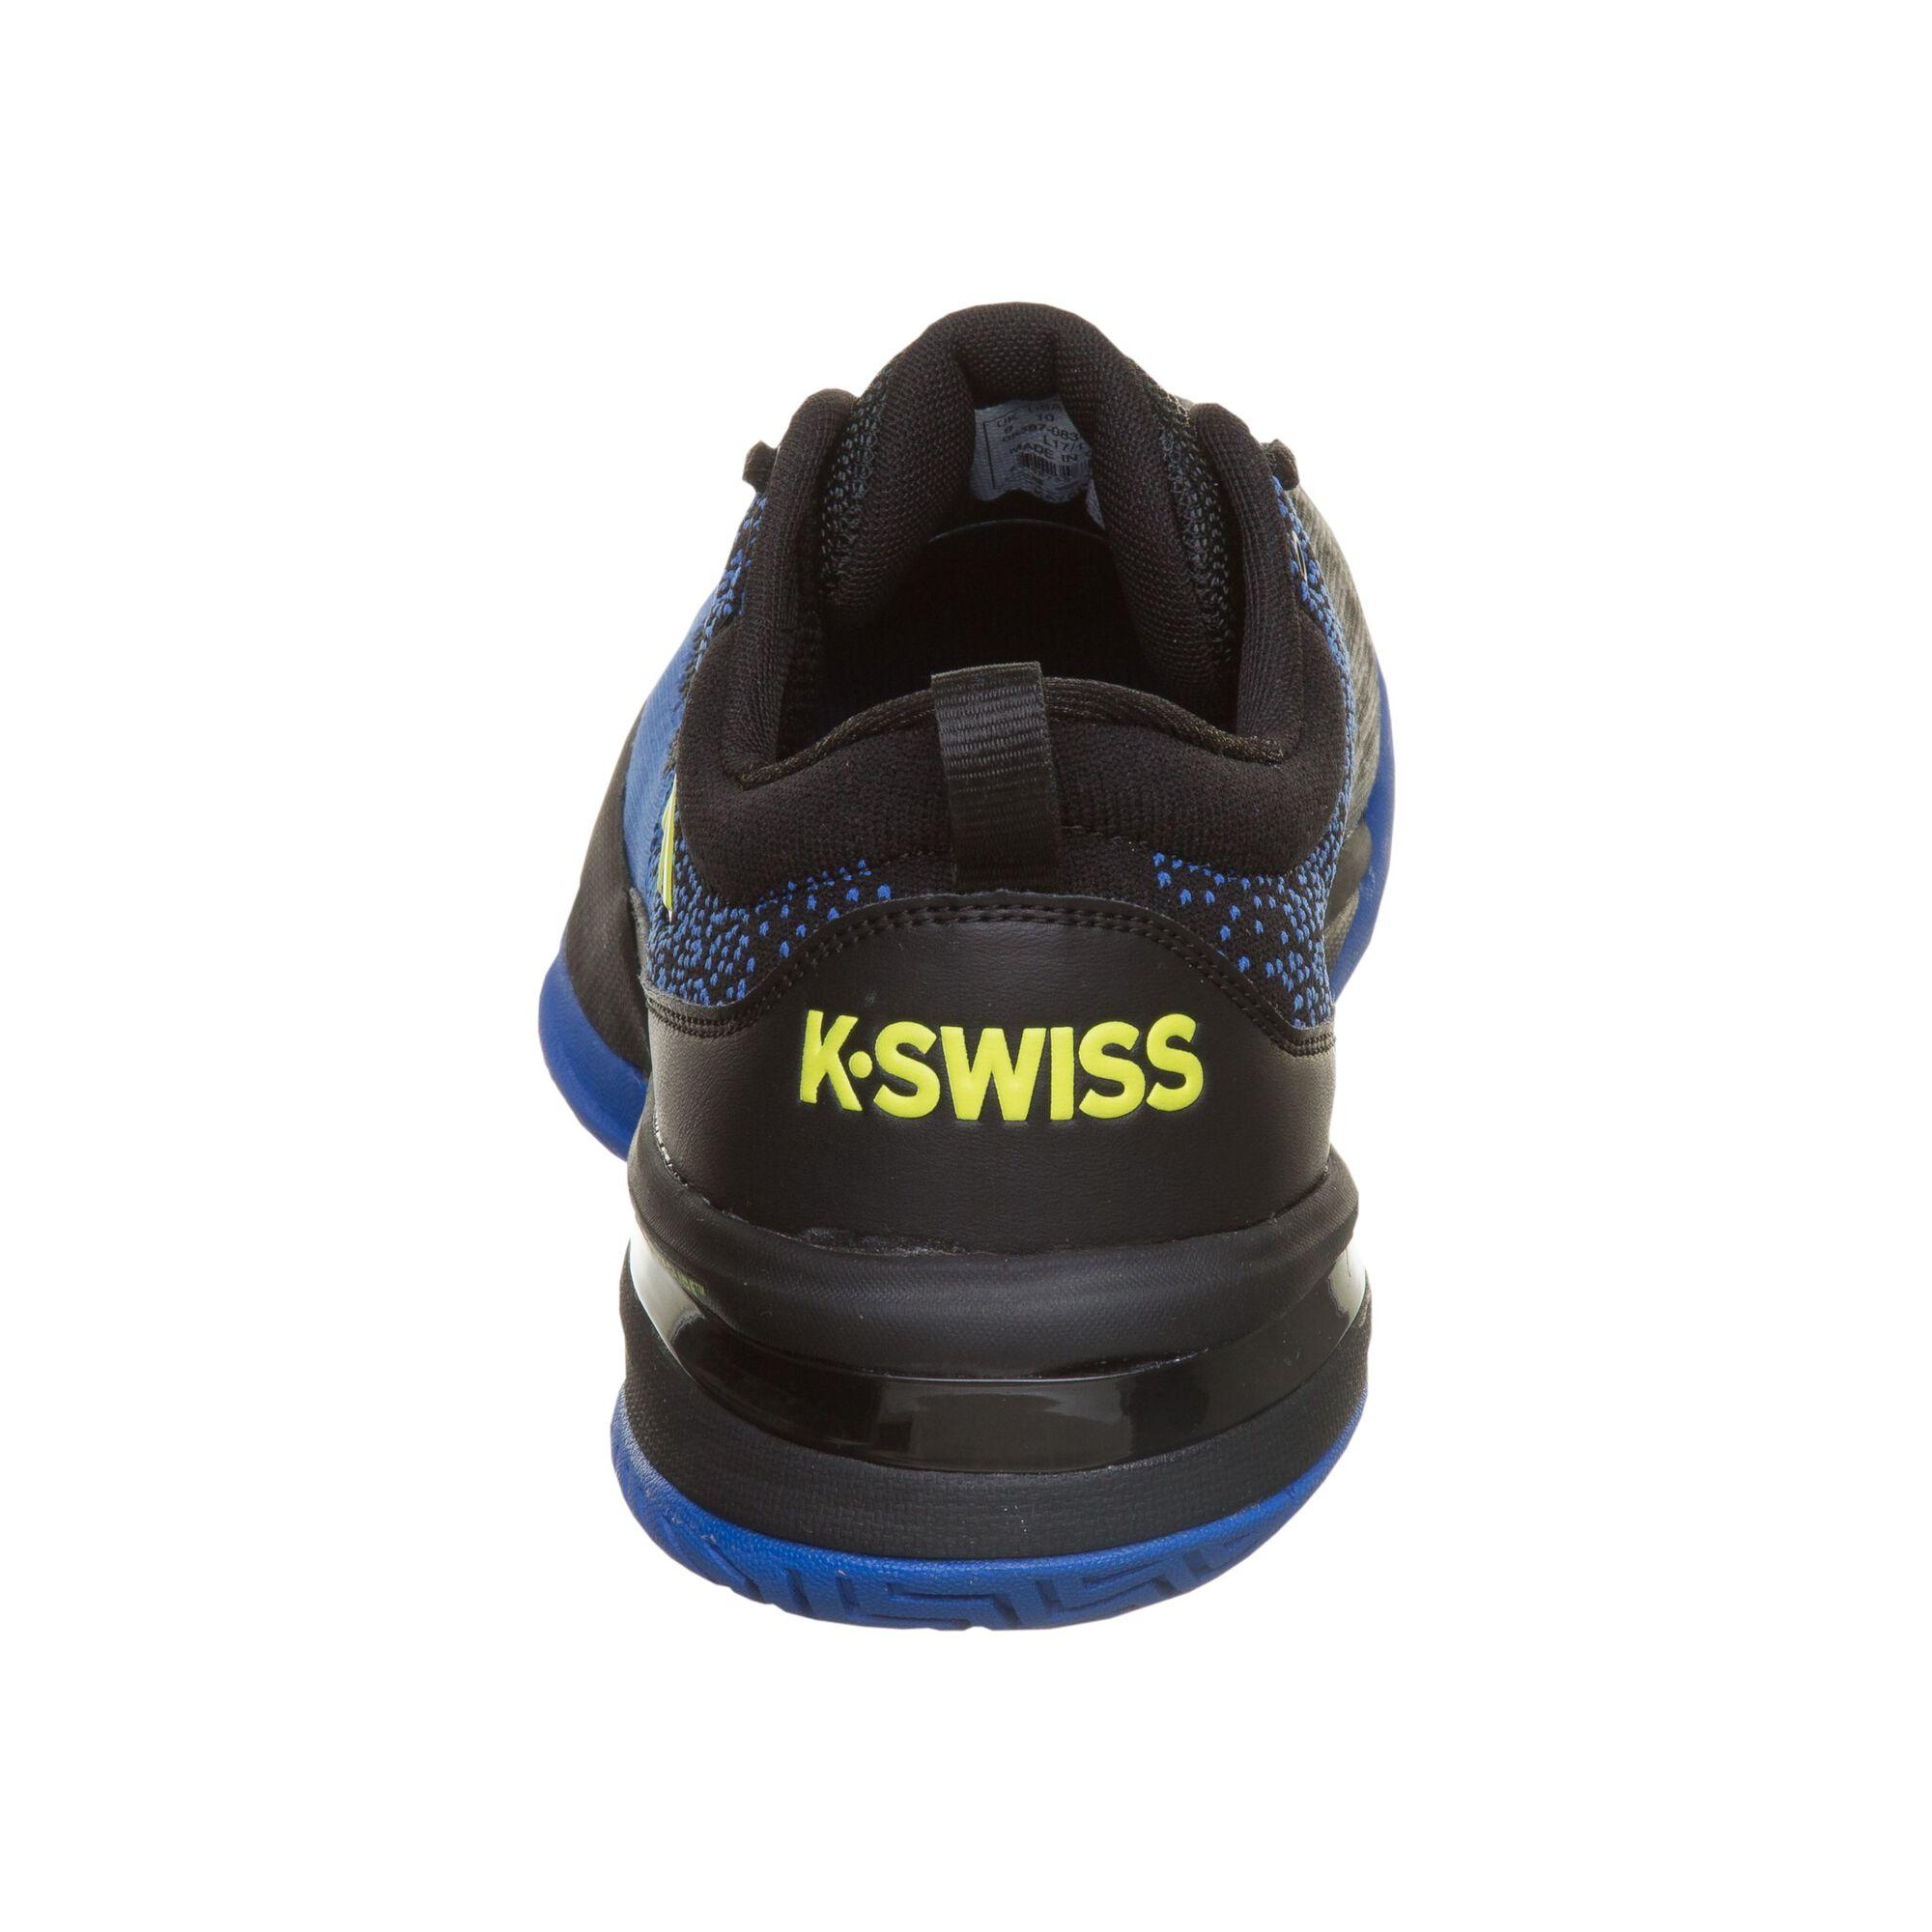 7e6130d58 K-Swiss Knitshot Zapatilla Todas Las Superficies Hombres - Negro ...